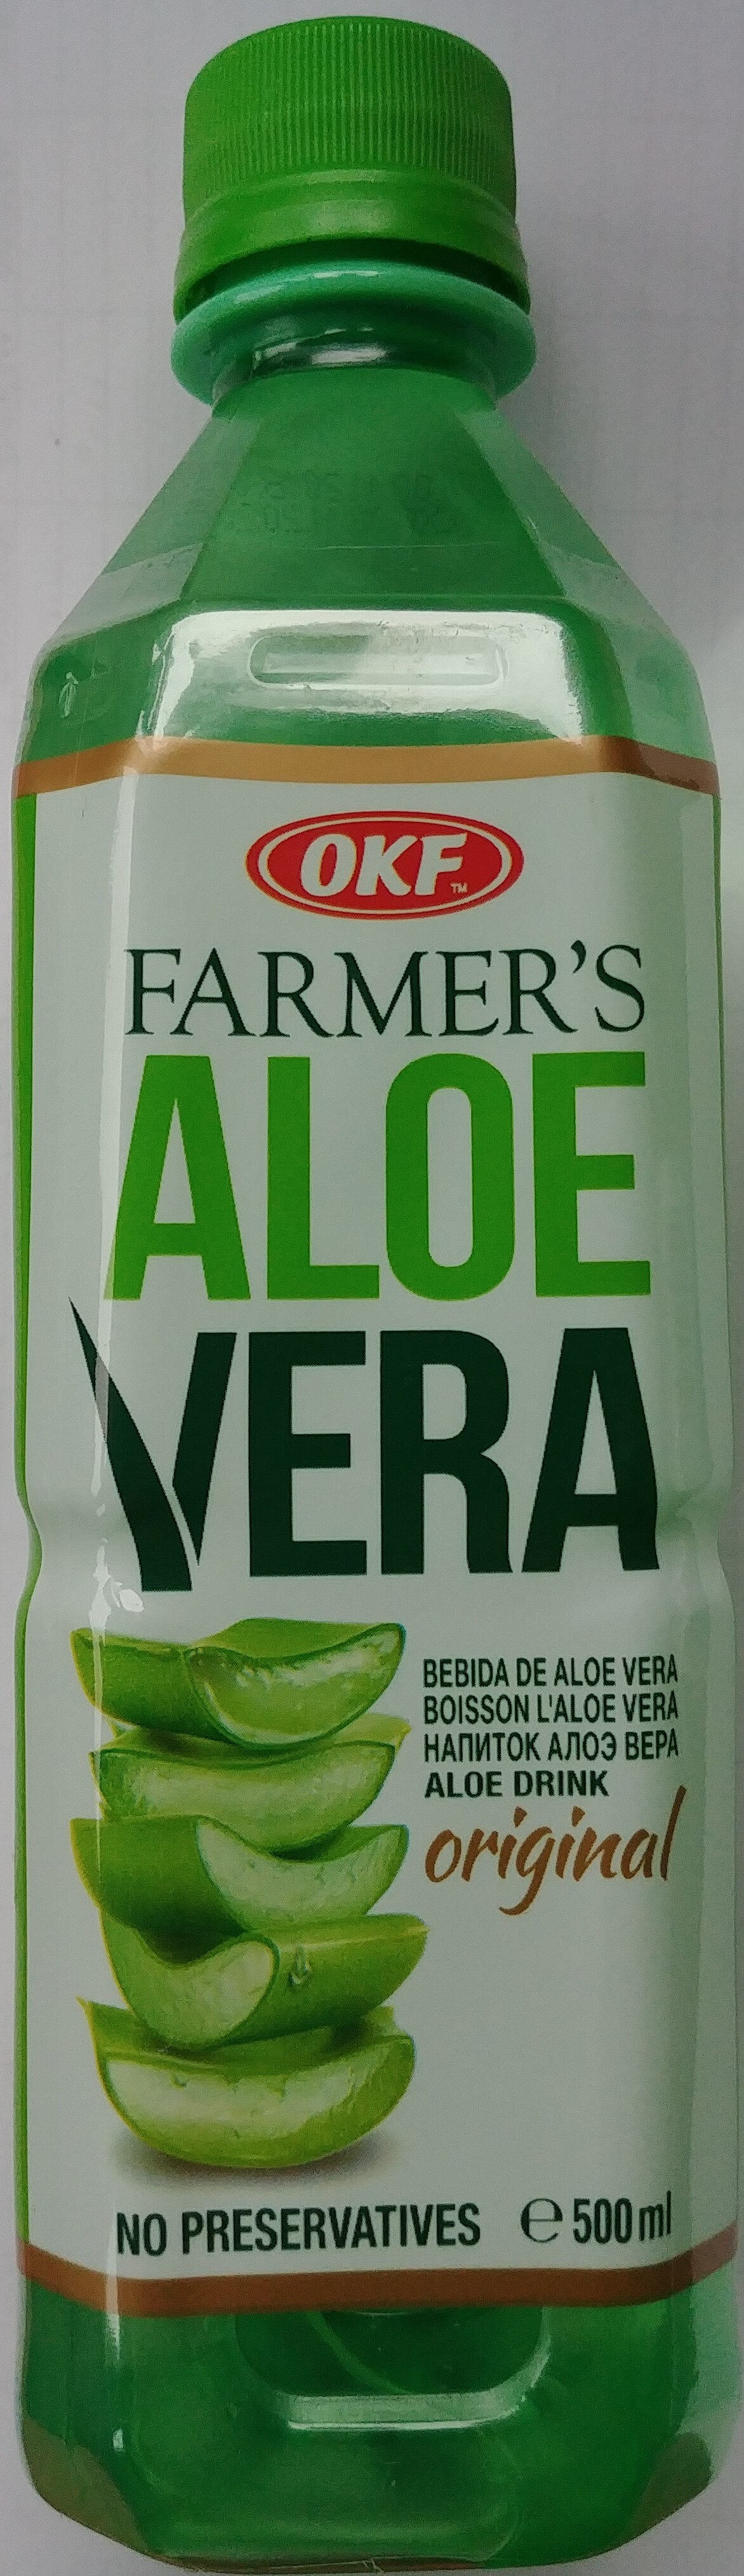 Napój Farmer's Aloe Vera - Produkt - pl